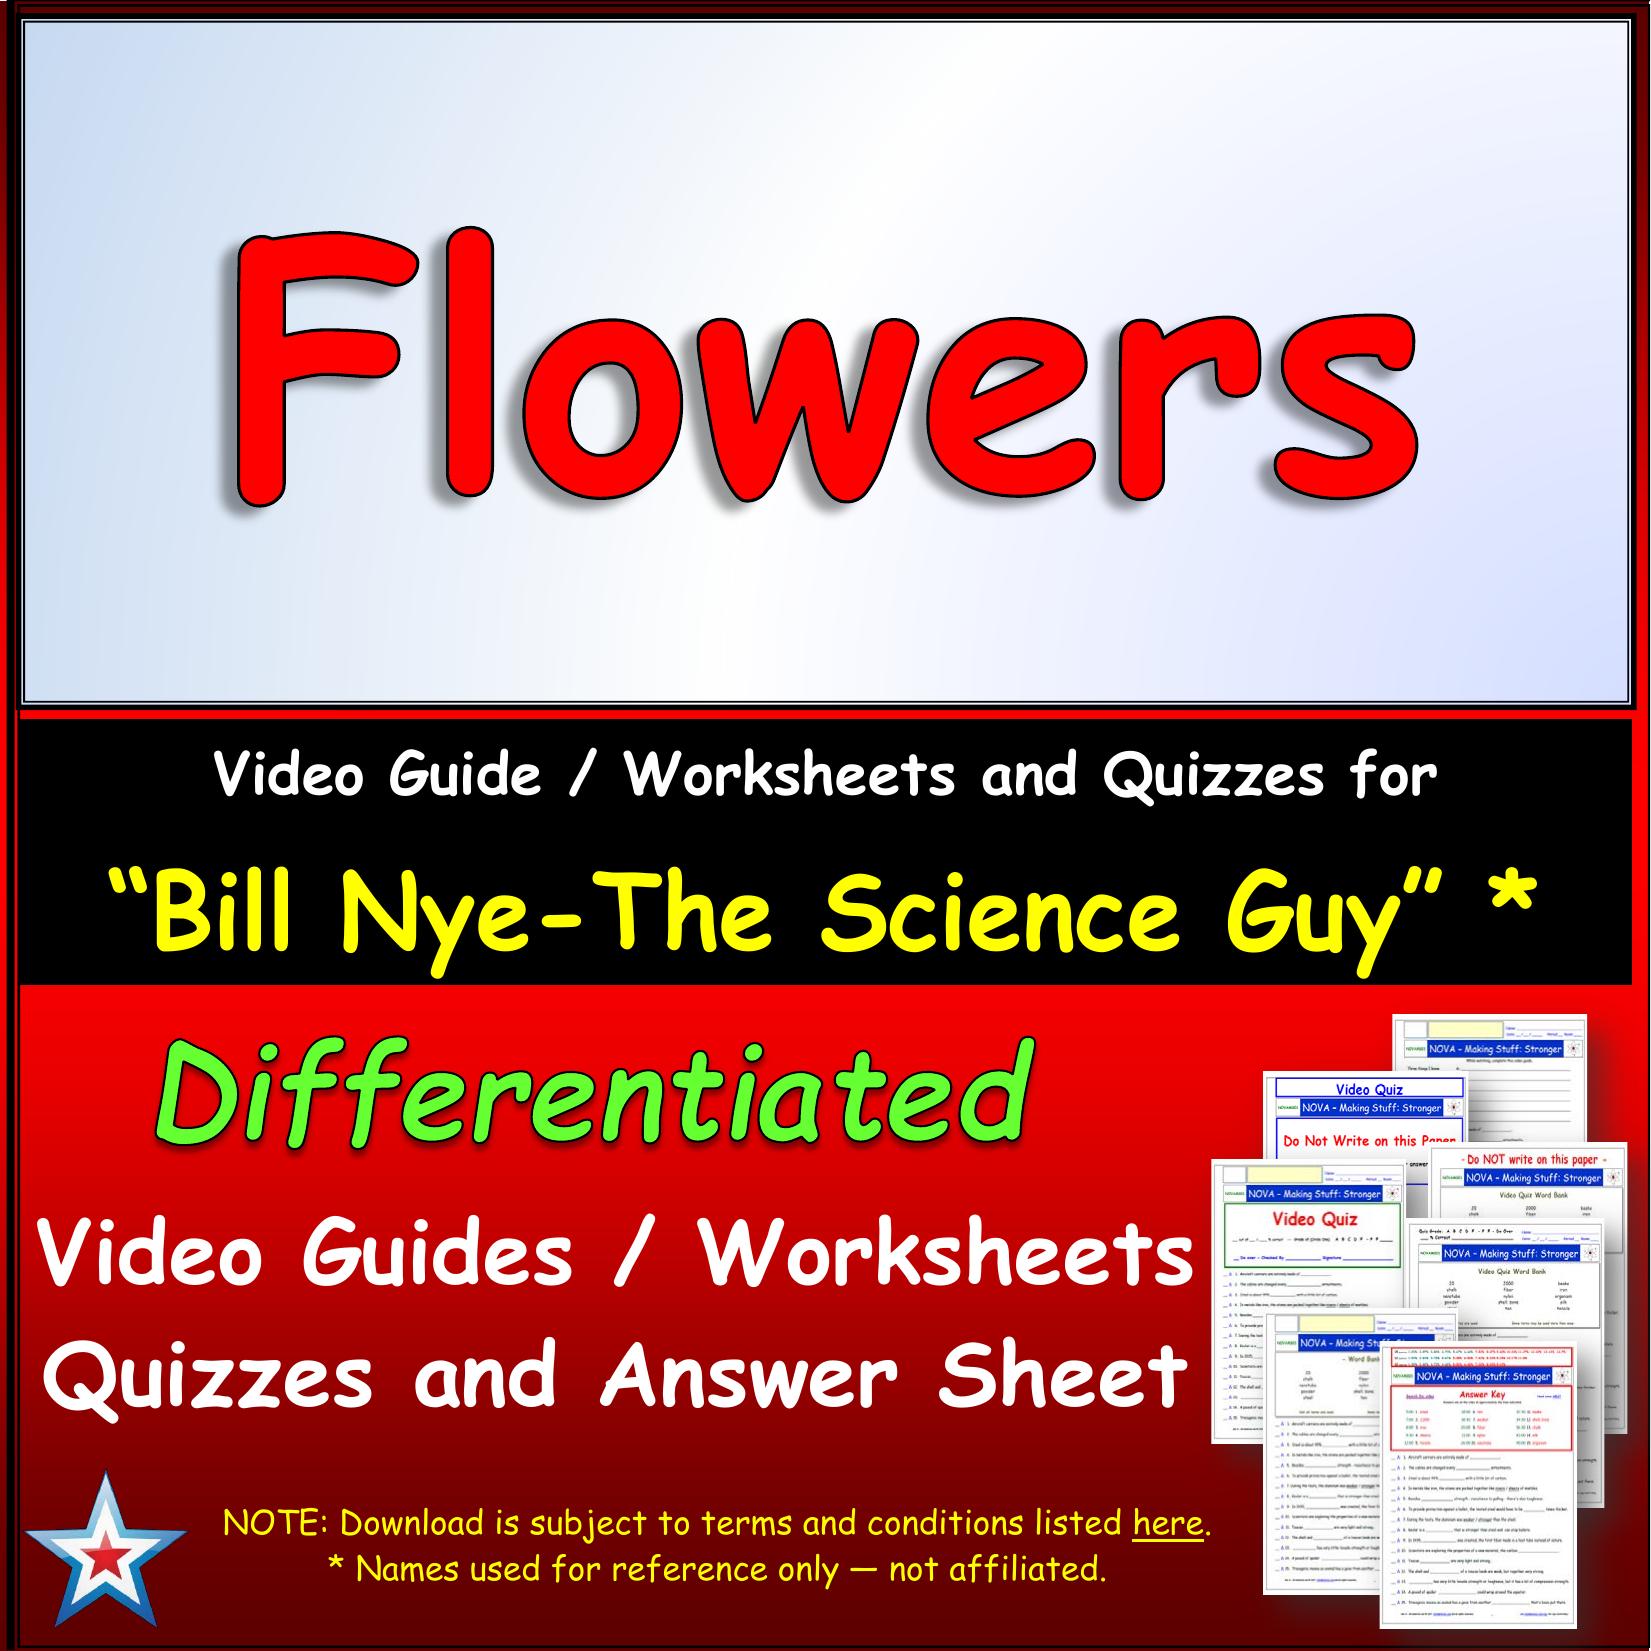 Bill Nye Flowers